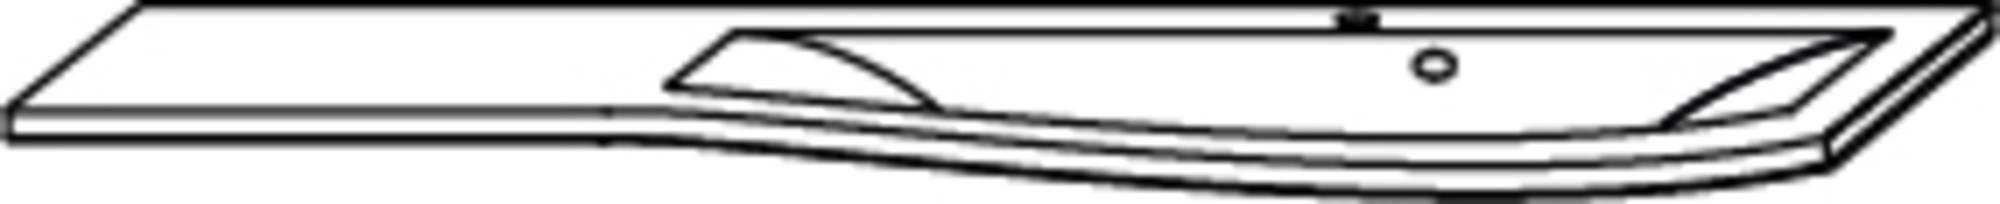 Saqu Curve 3 Meubelwastafel links 121,2x51,7x2,8 cm Wit